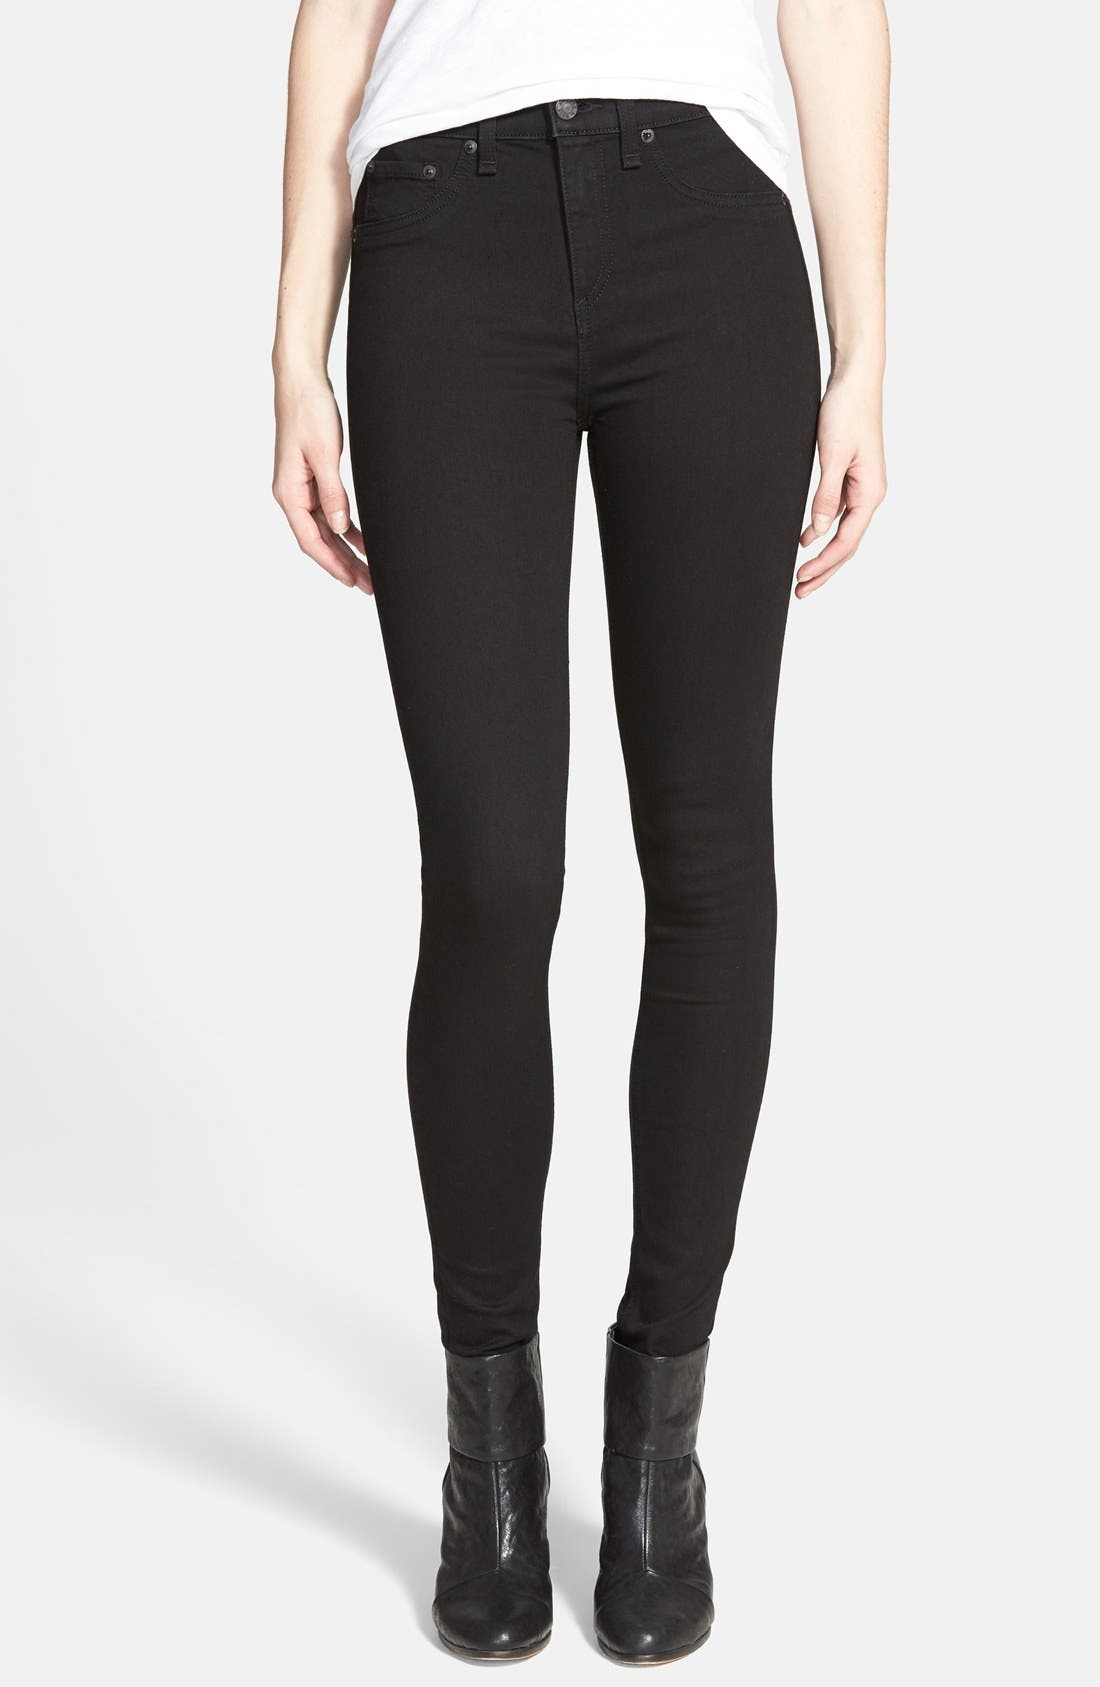 Alternate Image 1 Selected - rag & bone/JEAN High Waist Leggings (Black)